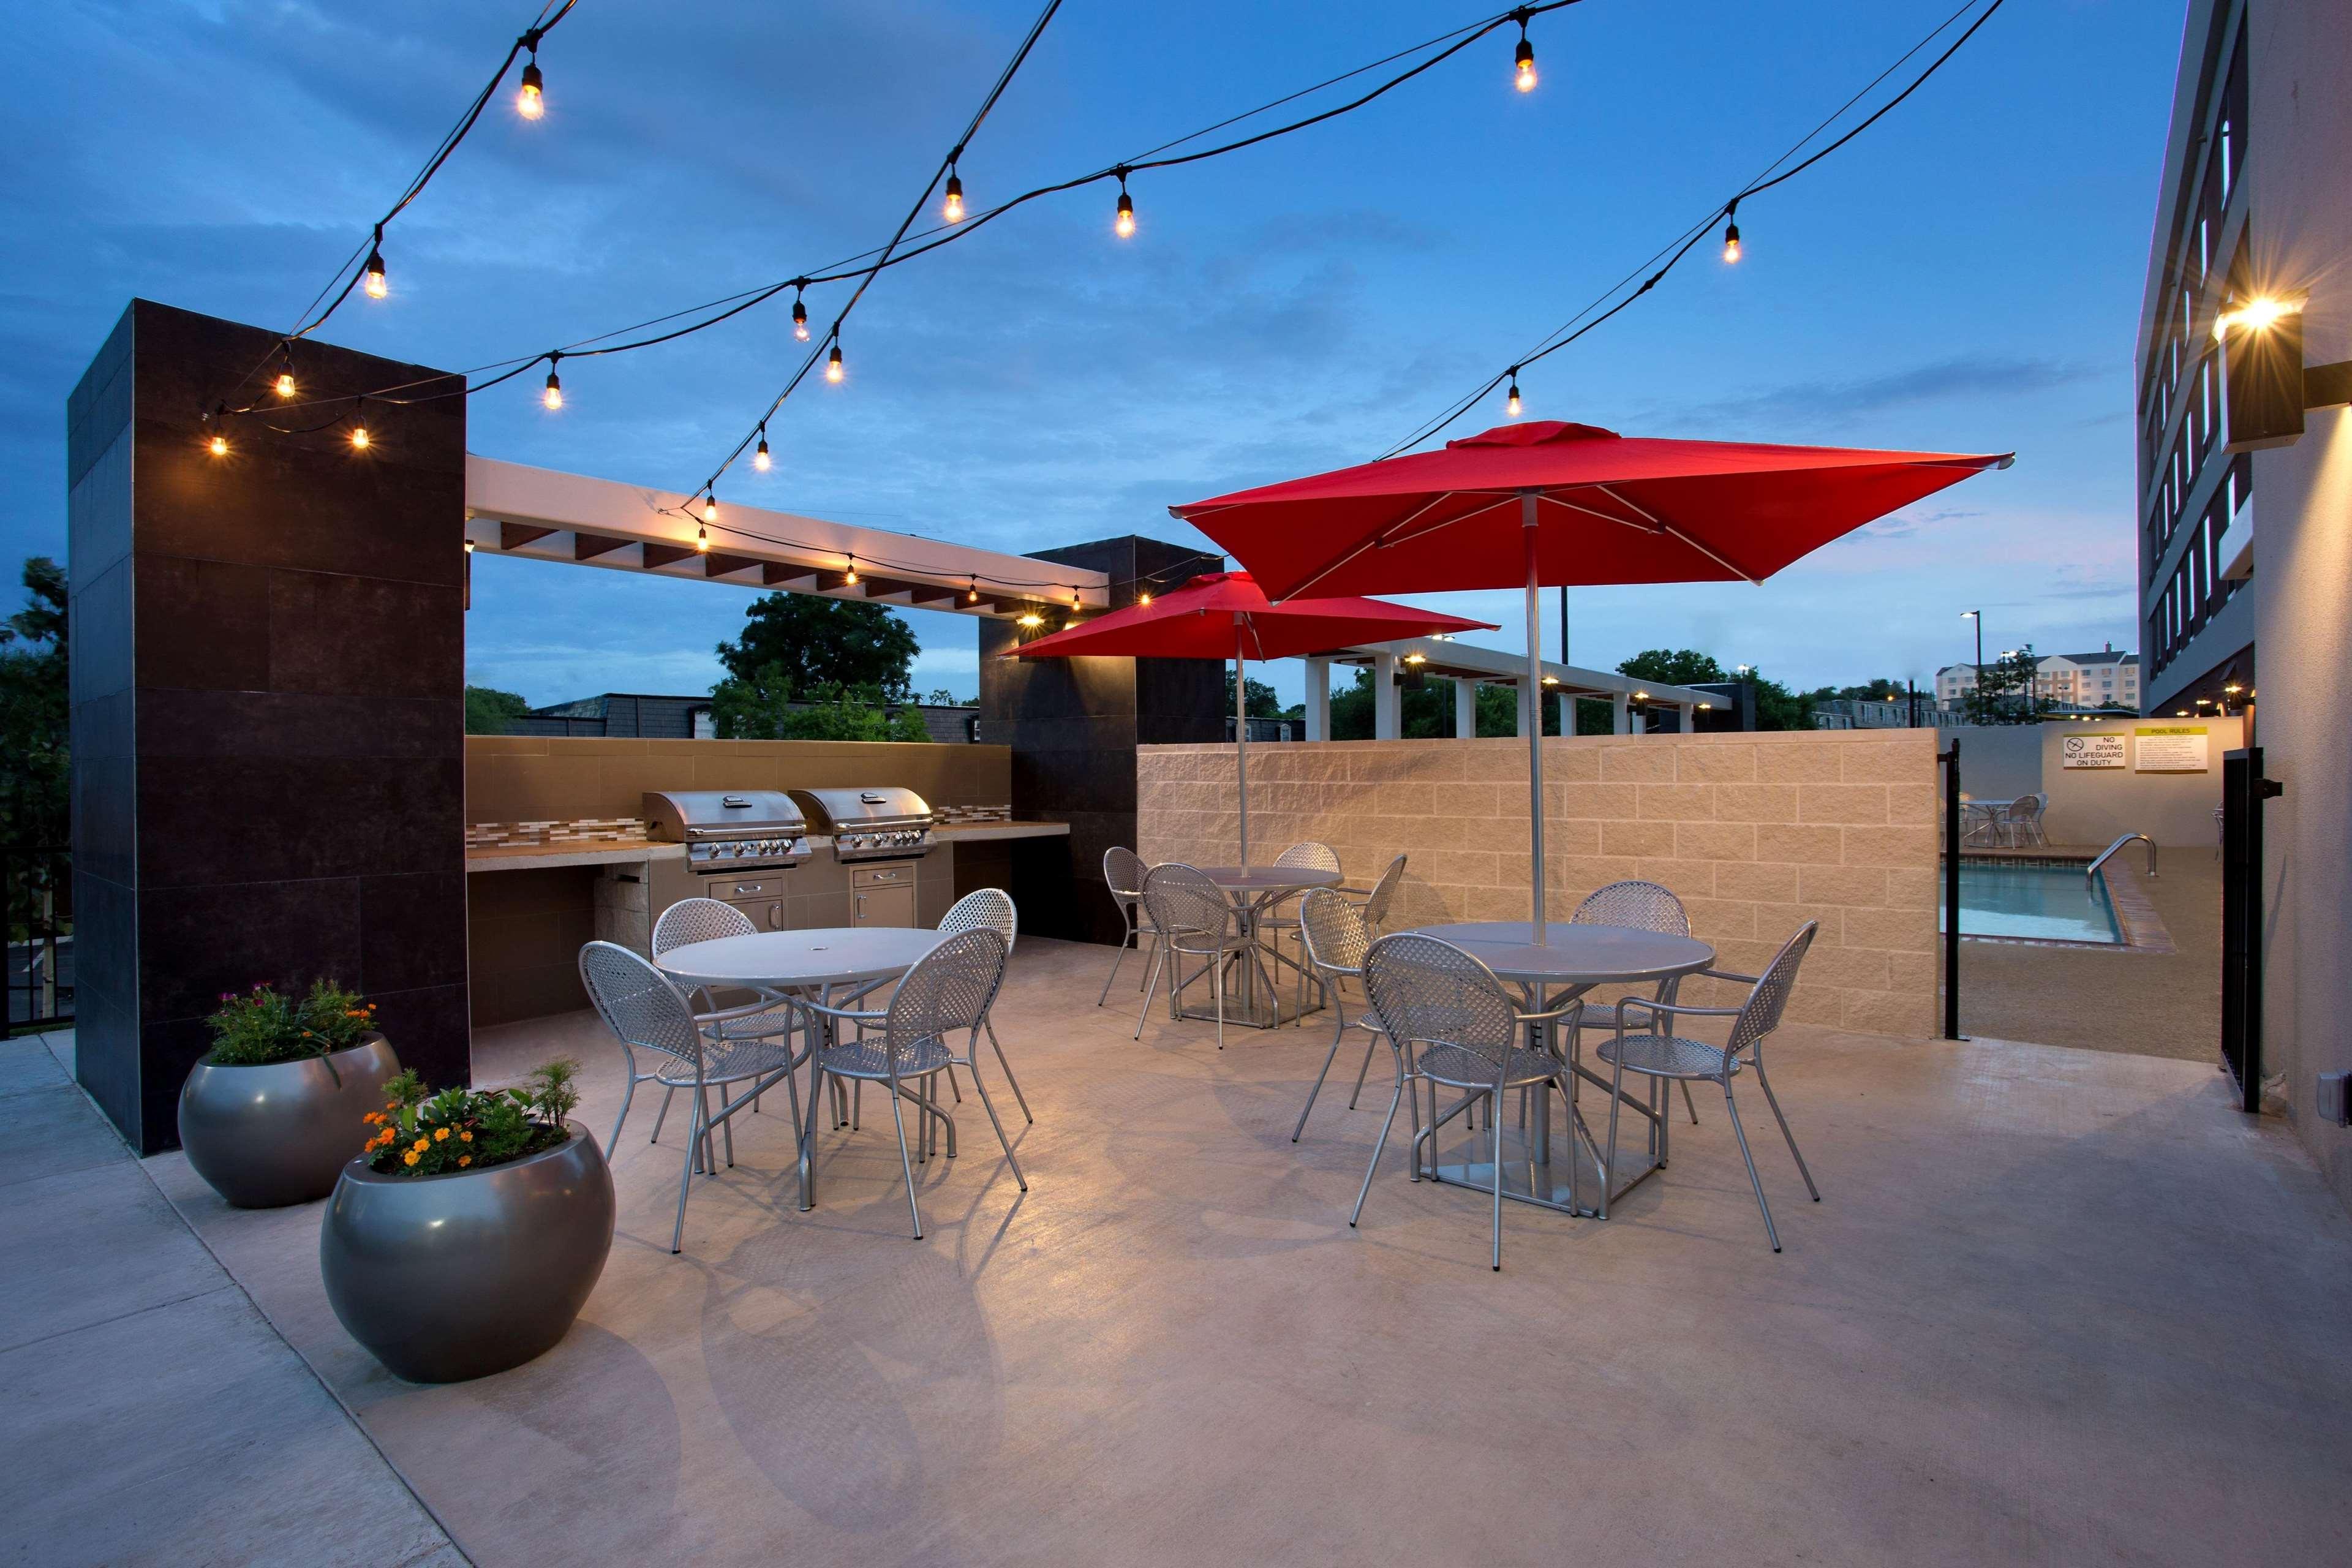 Home2 Suites by Hilton San Antonio Airport, TX image 8